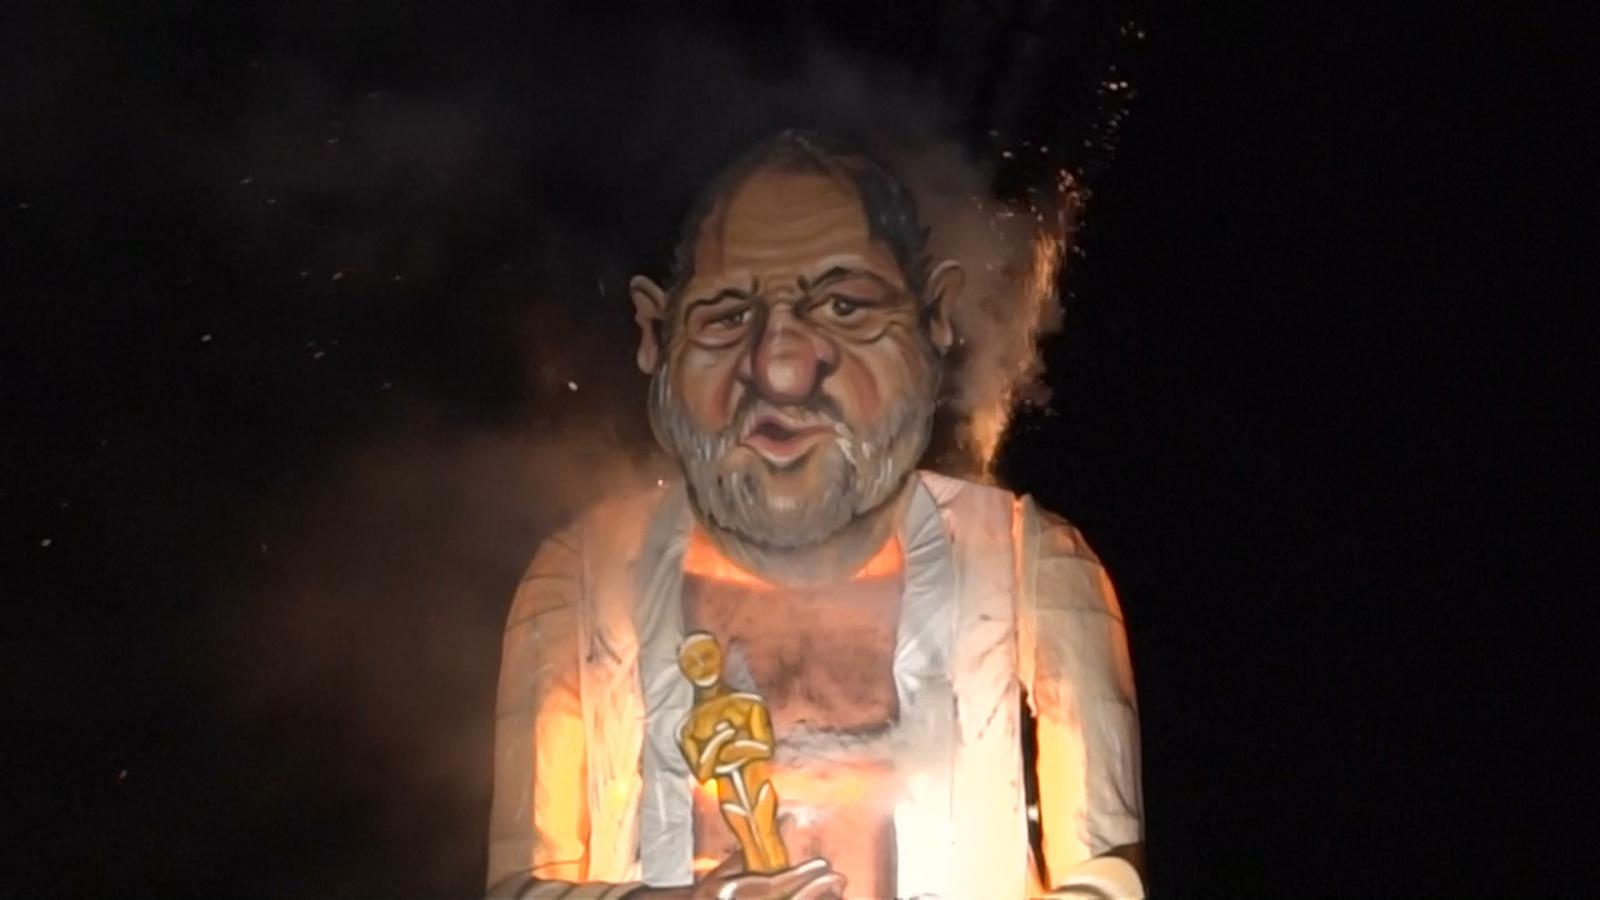 effigy-of-harvey-weinstein-burnt-at-british-towns-bonfire-night